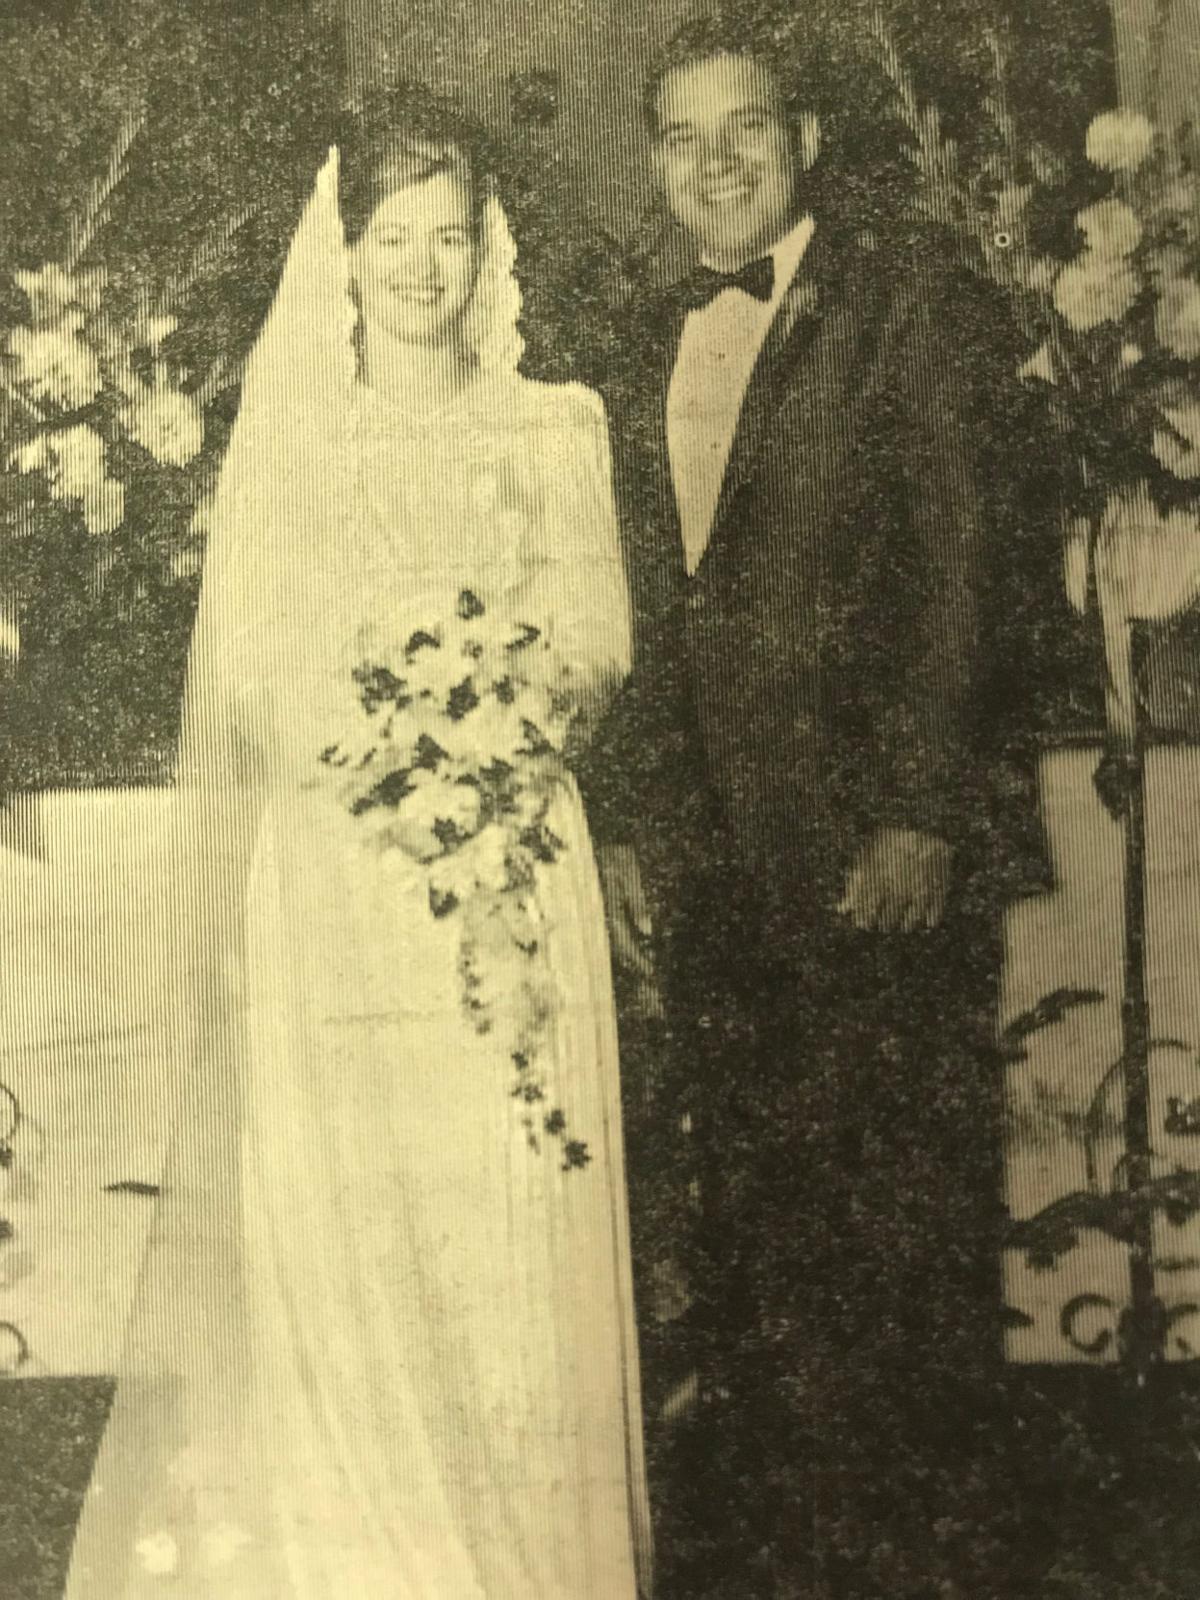 Janice Ogilvie Marries in Corvallis Ceremony